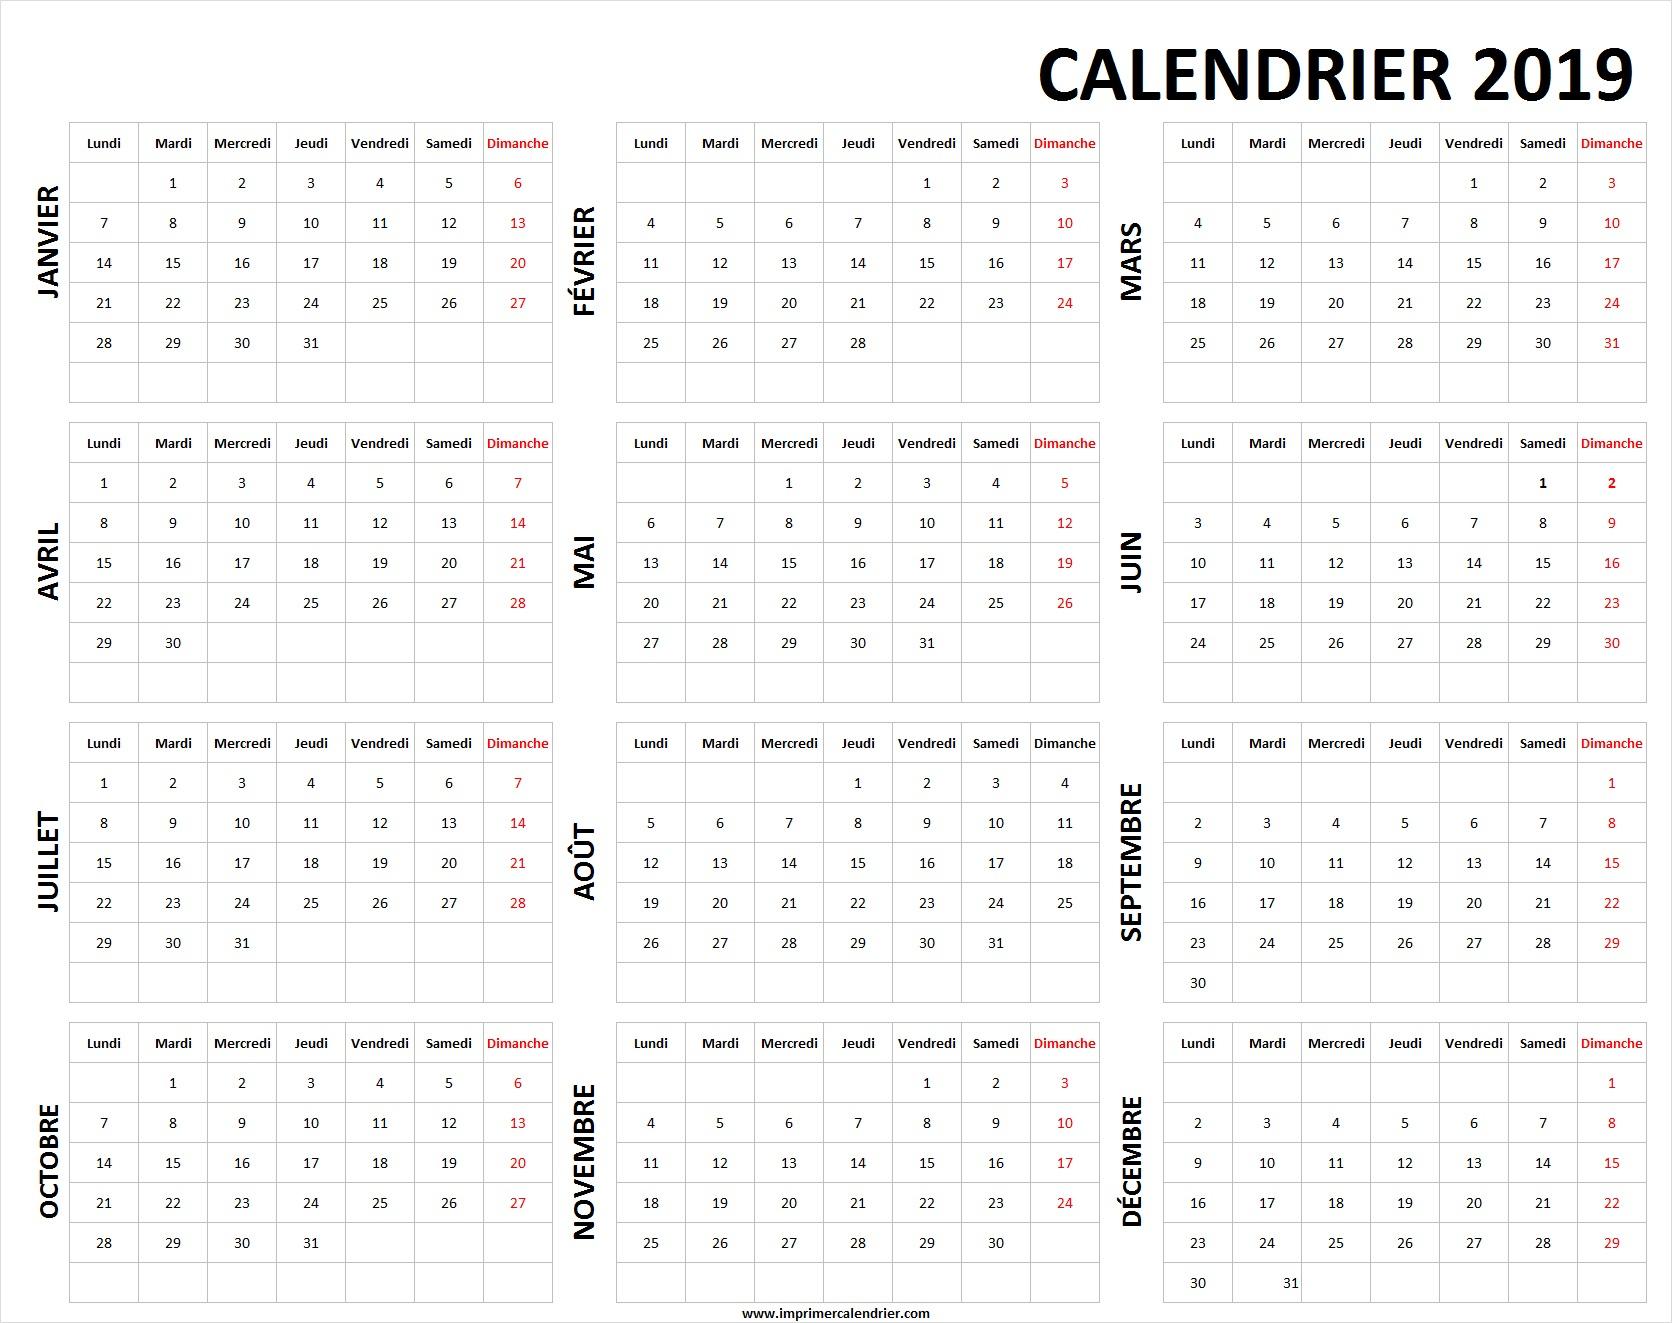 Calendrier 2019 Vierge À Imprimer | Calendrier 2019 Vierge À concernant Calendrier Annuel 2019 À Imprimer Gratuit